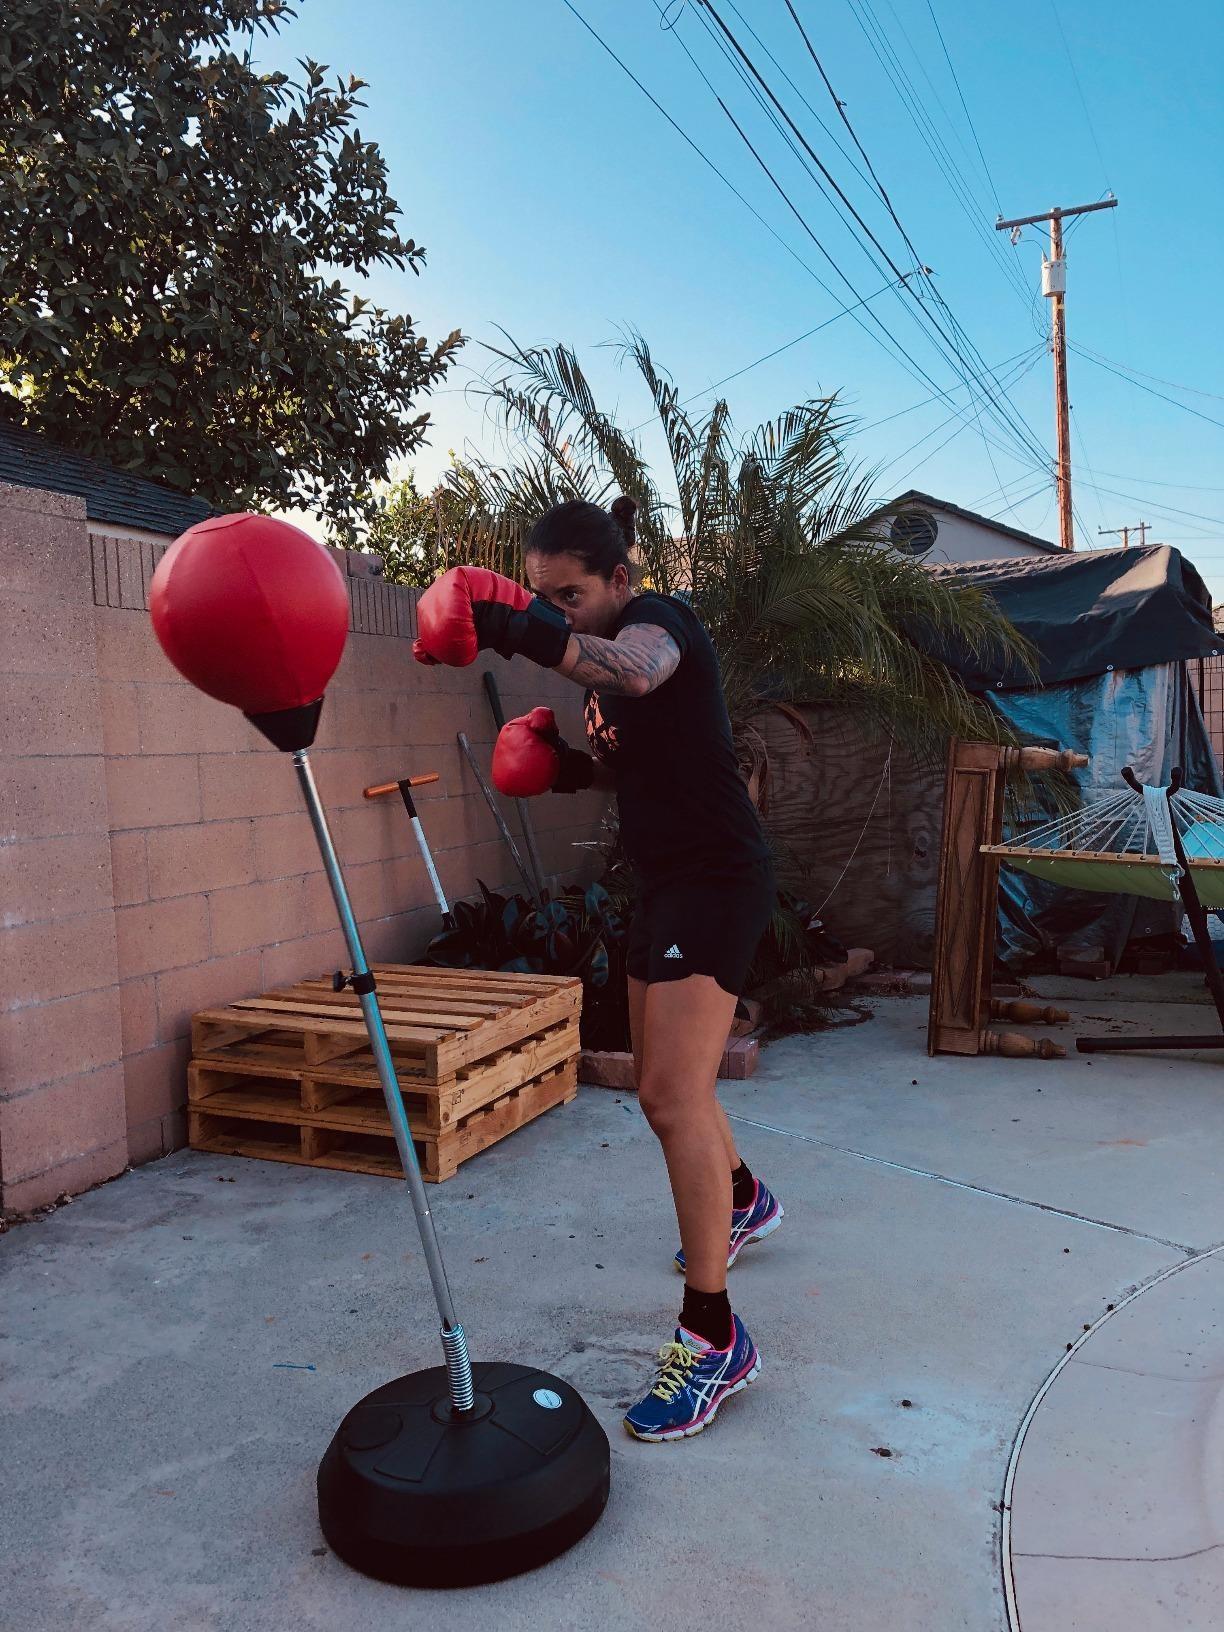 Reviewer using the punching bag set